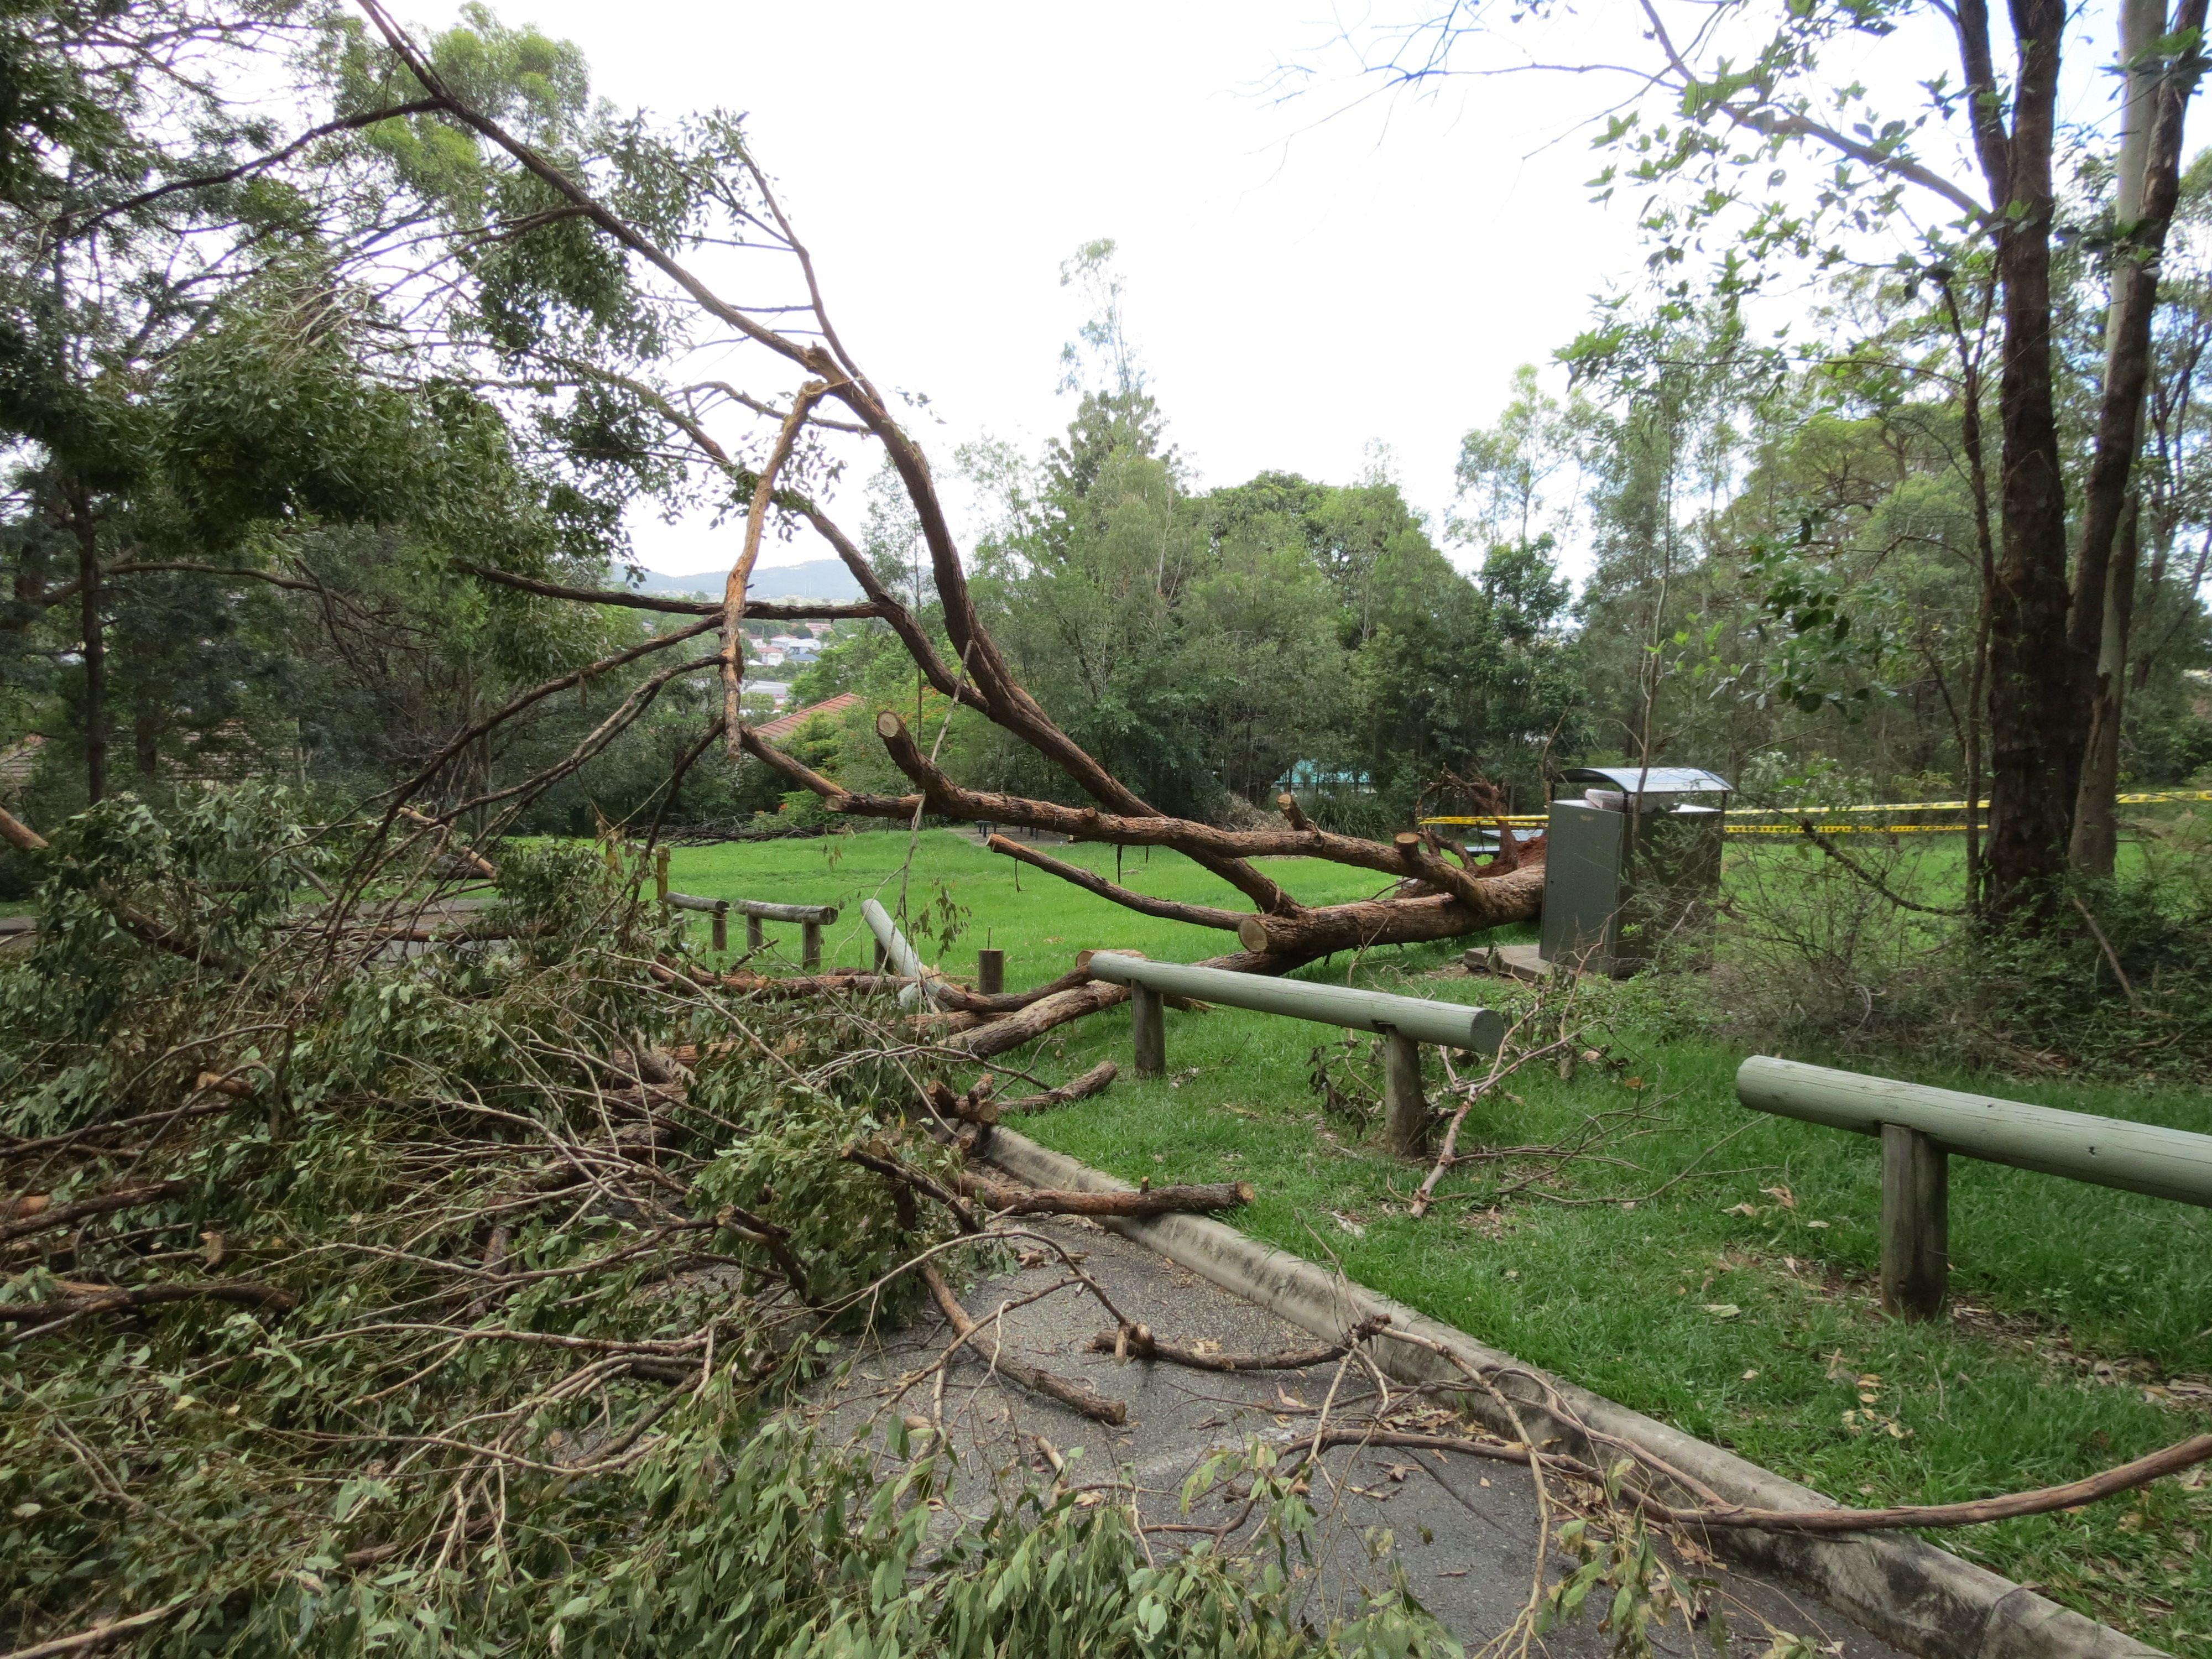 GPP storm damage - 5 Feb 13